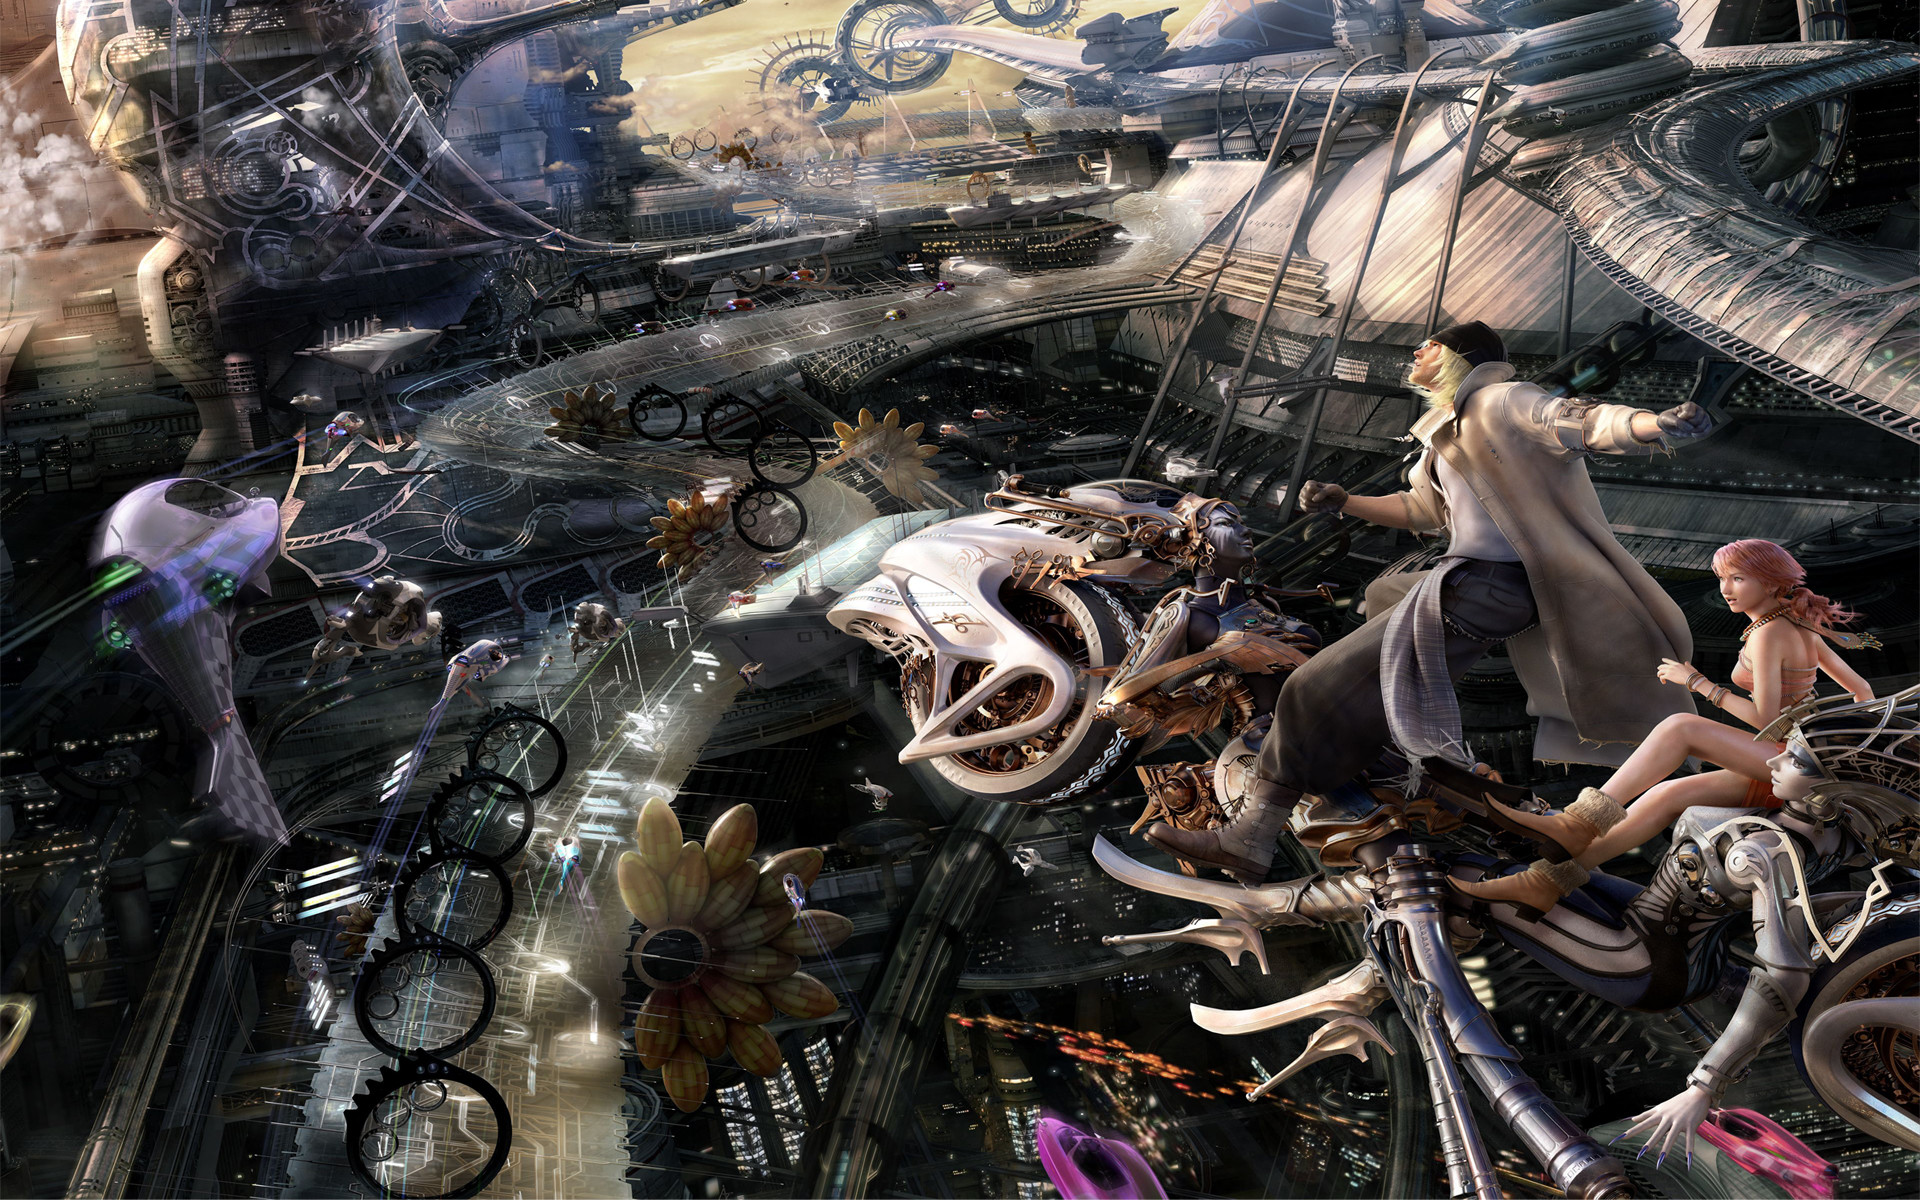 Final Fantasy Xii The Zodiac Age Wallpaper 01 1920x1080